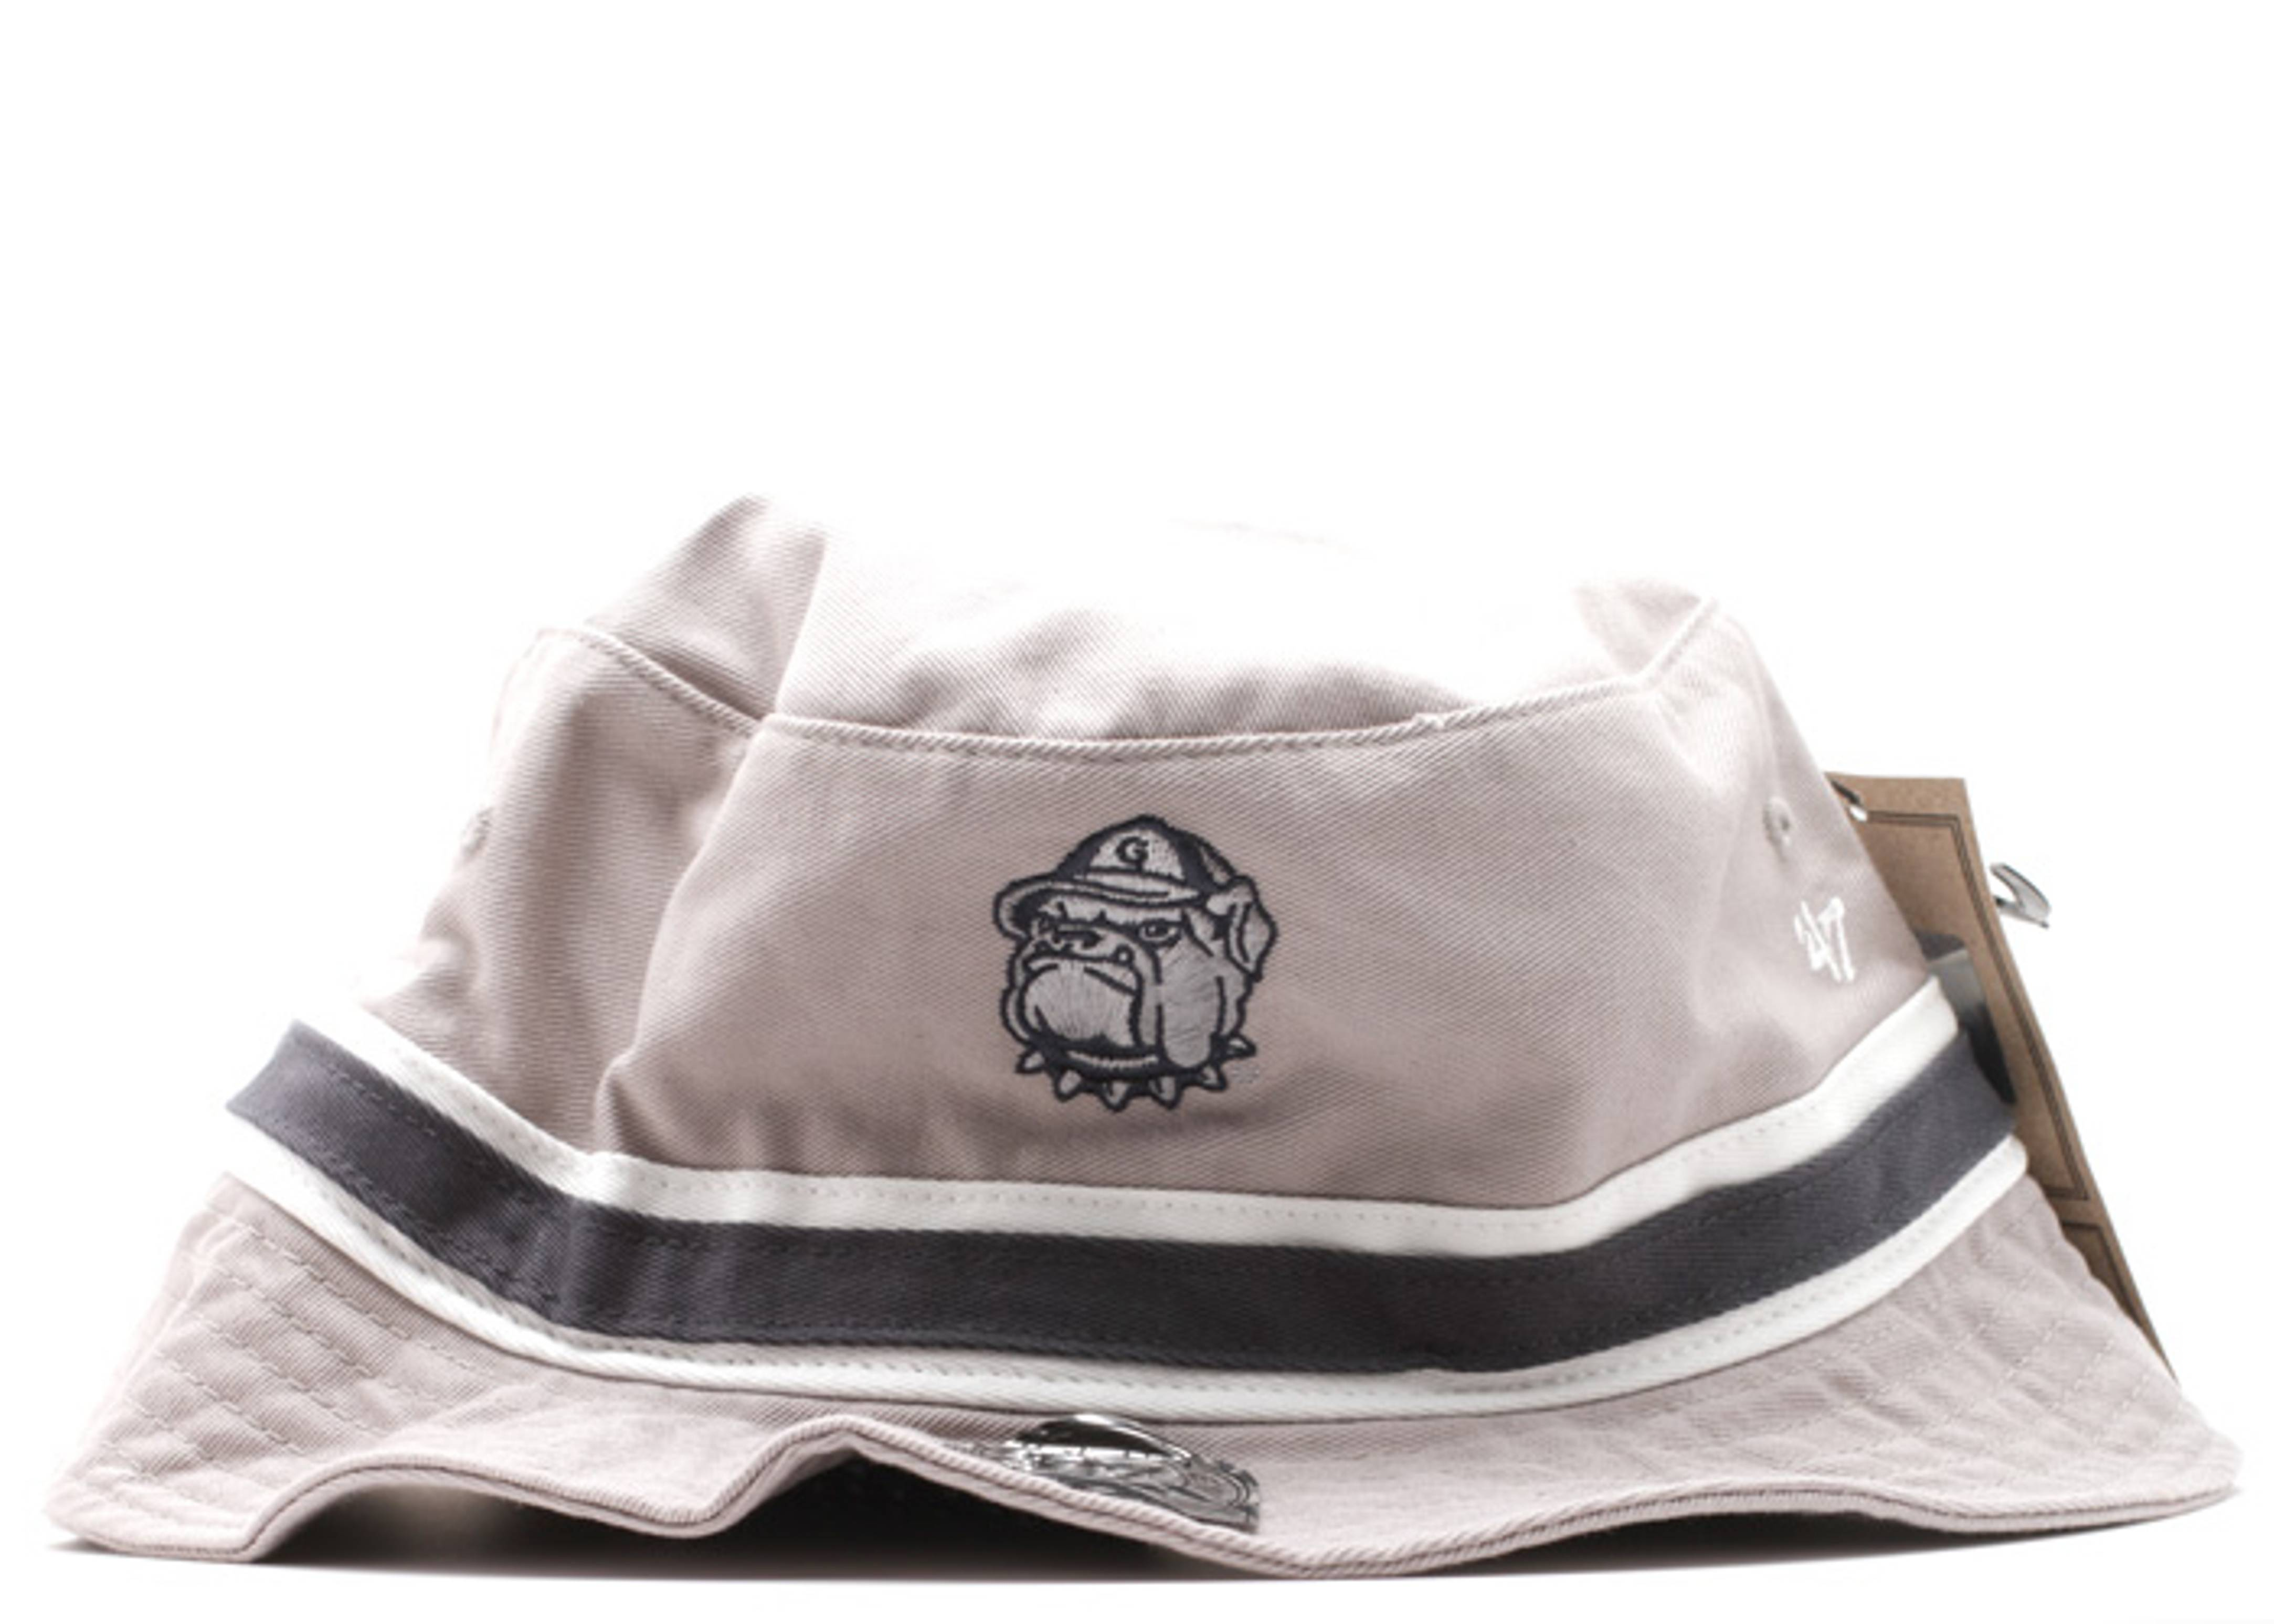 georgetown hoyas bucket hat